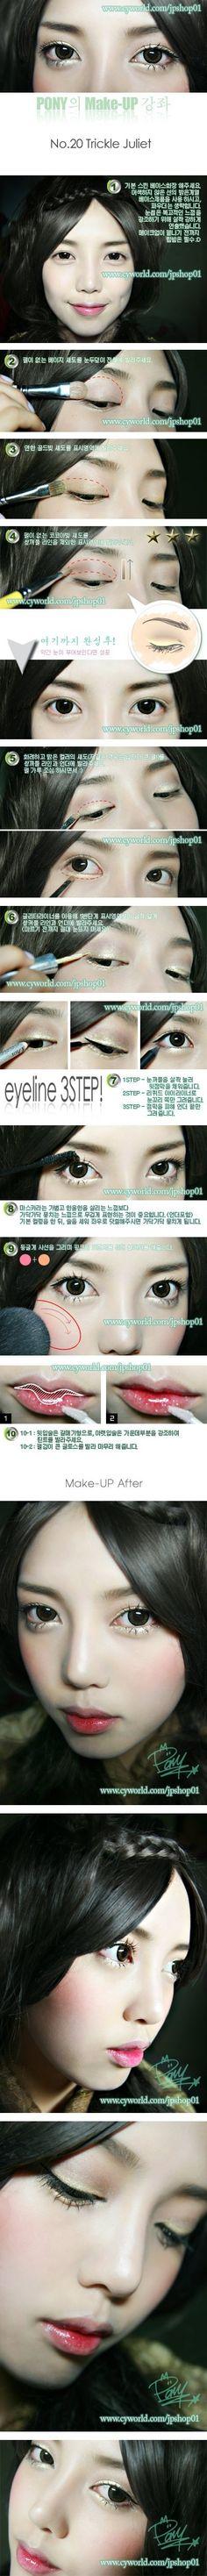 http://www.cyworld.com/jpshop01 : website of ulzzang makeup. Here is Trickle Juliet makeup tutorial